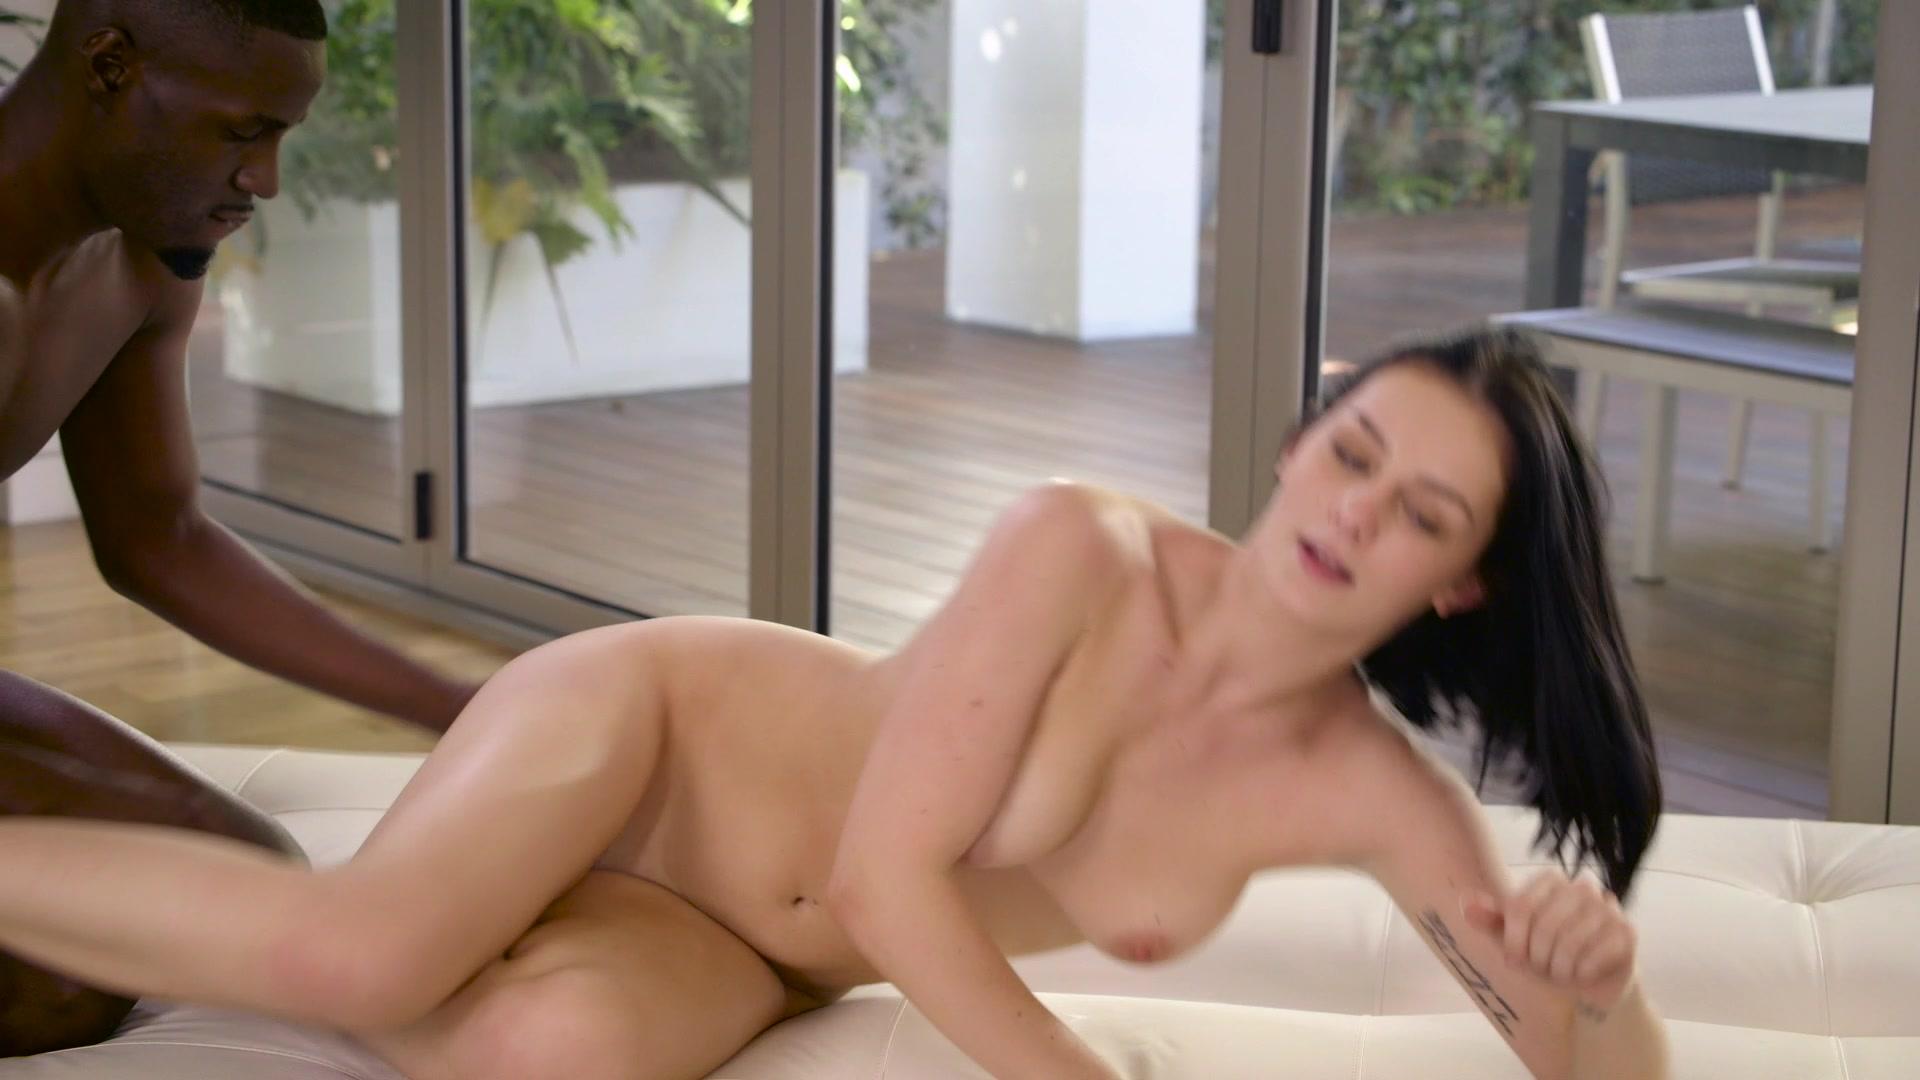 Amanda Lane Nude buy hot wife used @ adult dvd empire